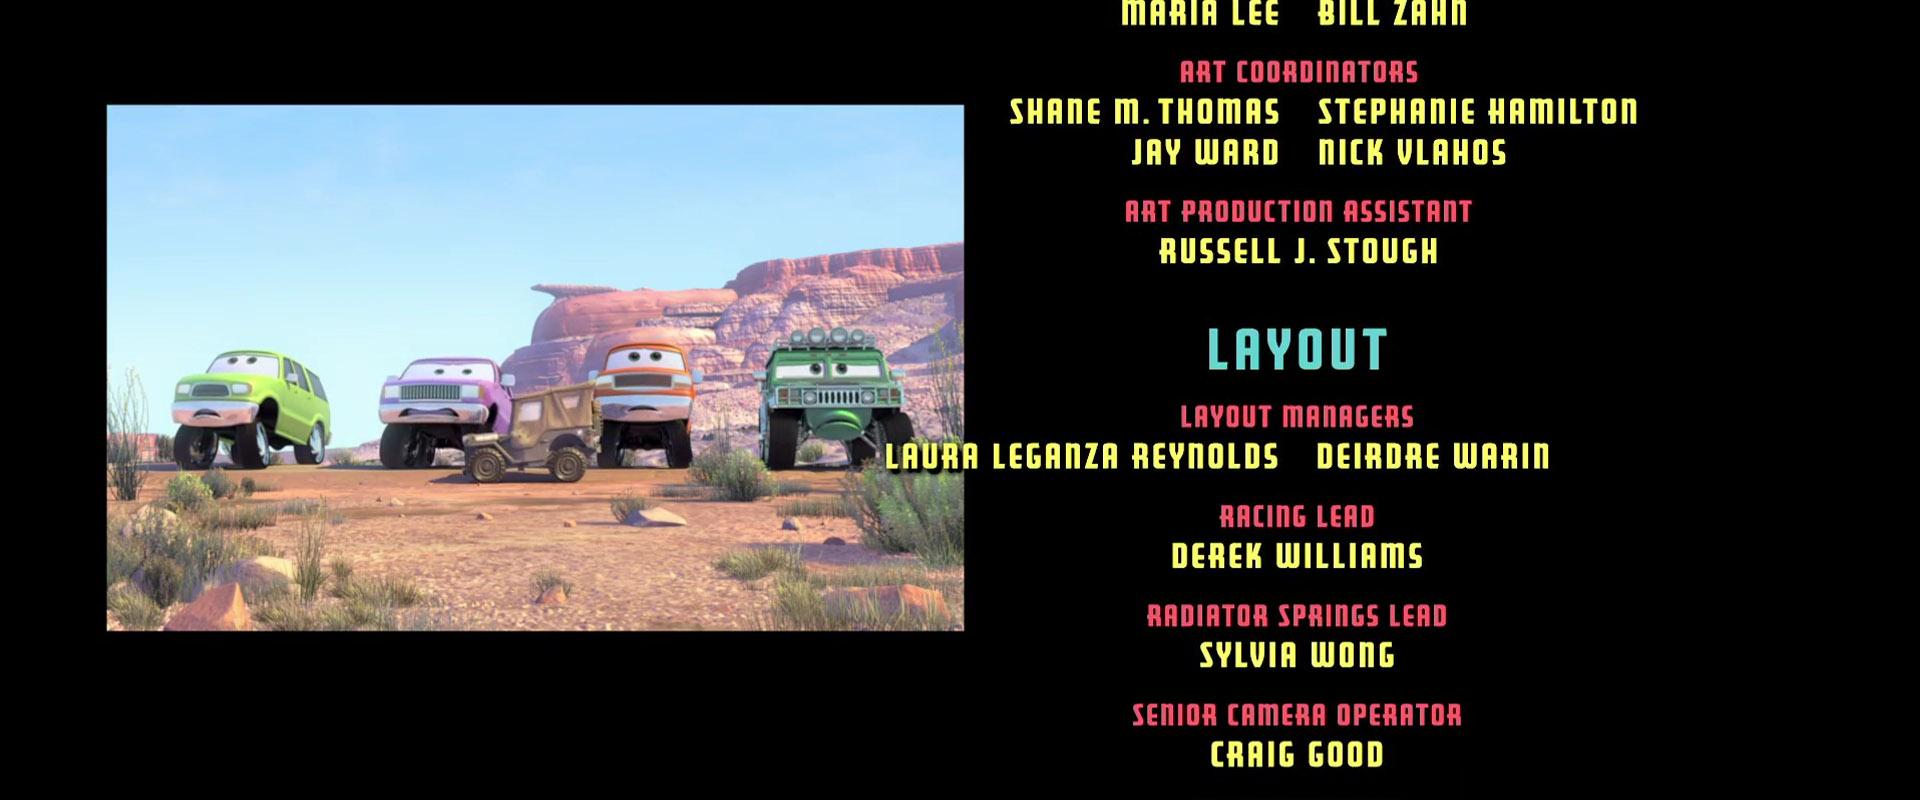 murphy personnage character pixar disney cars